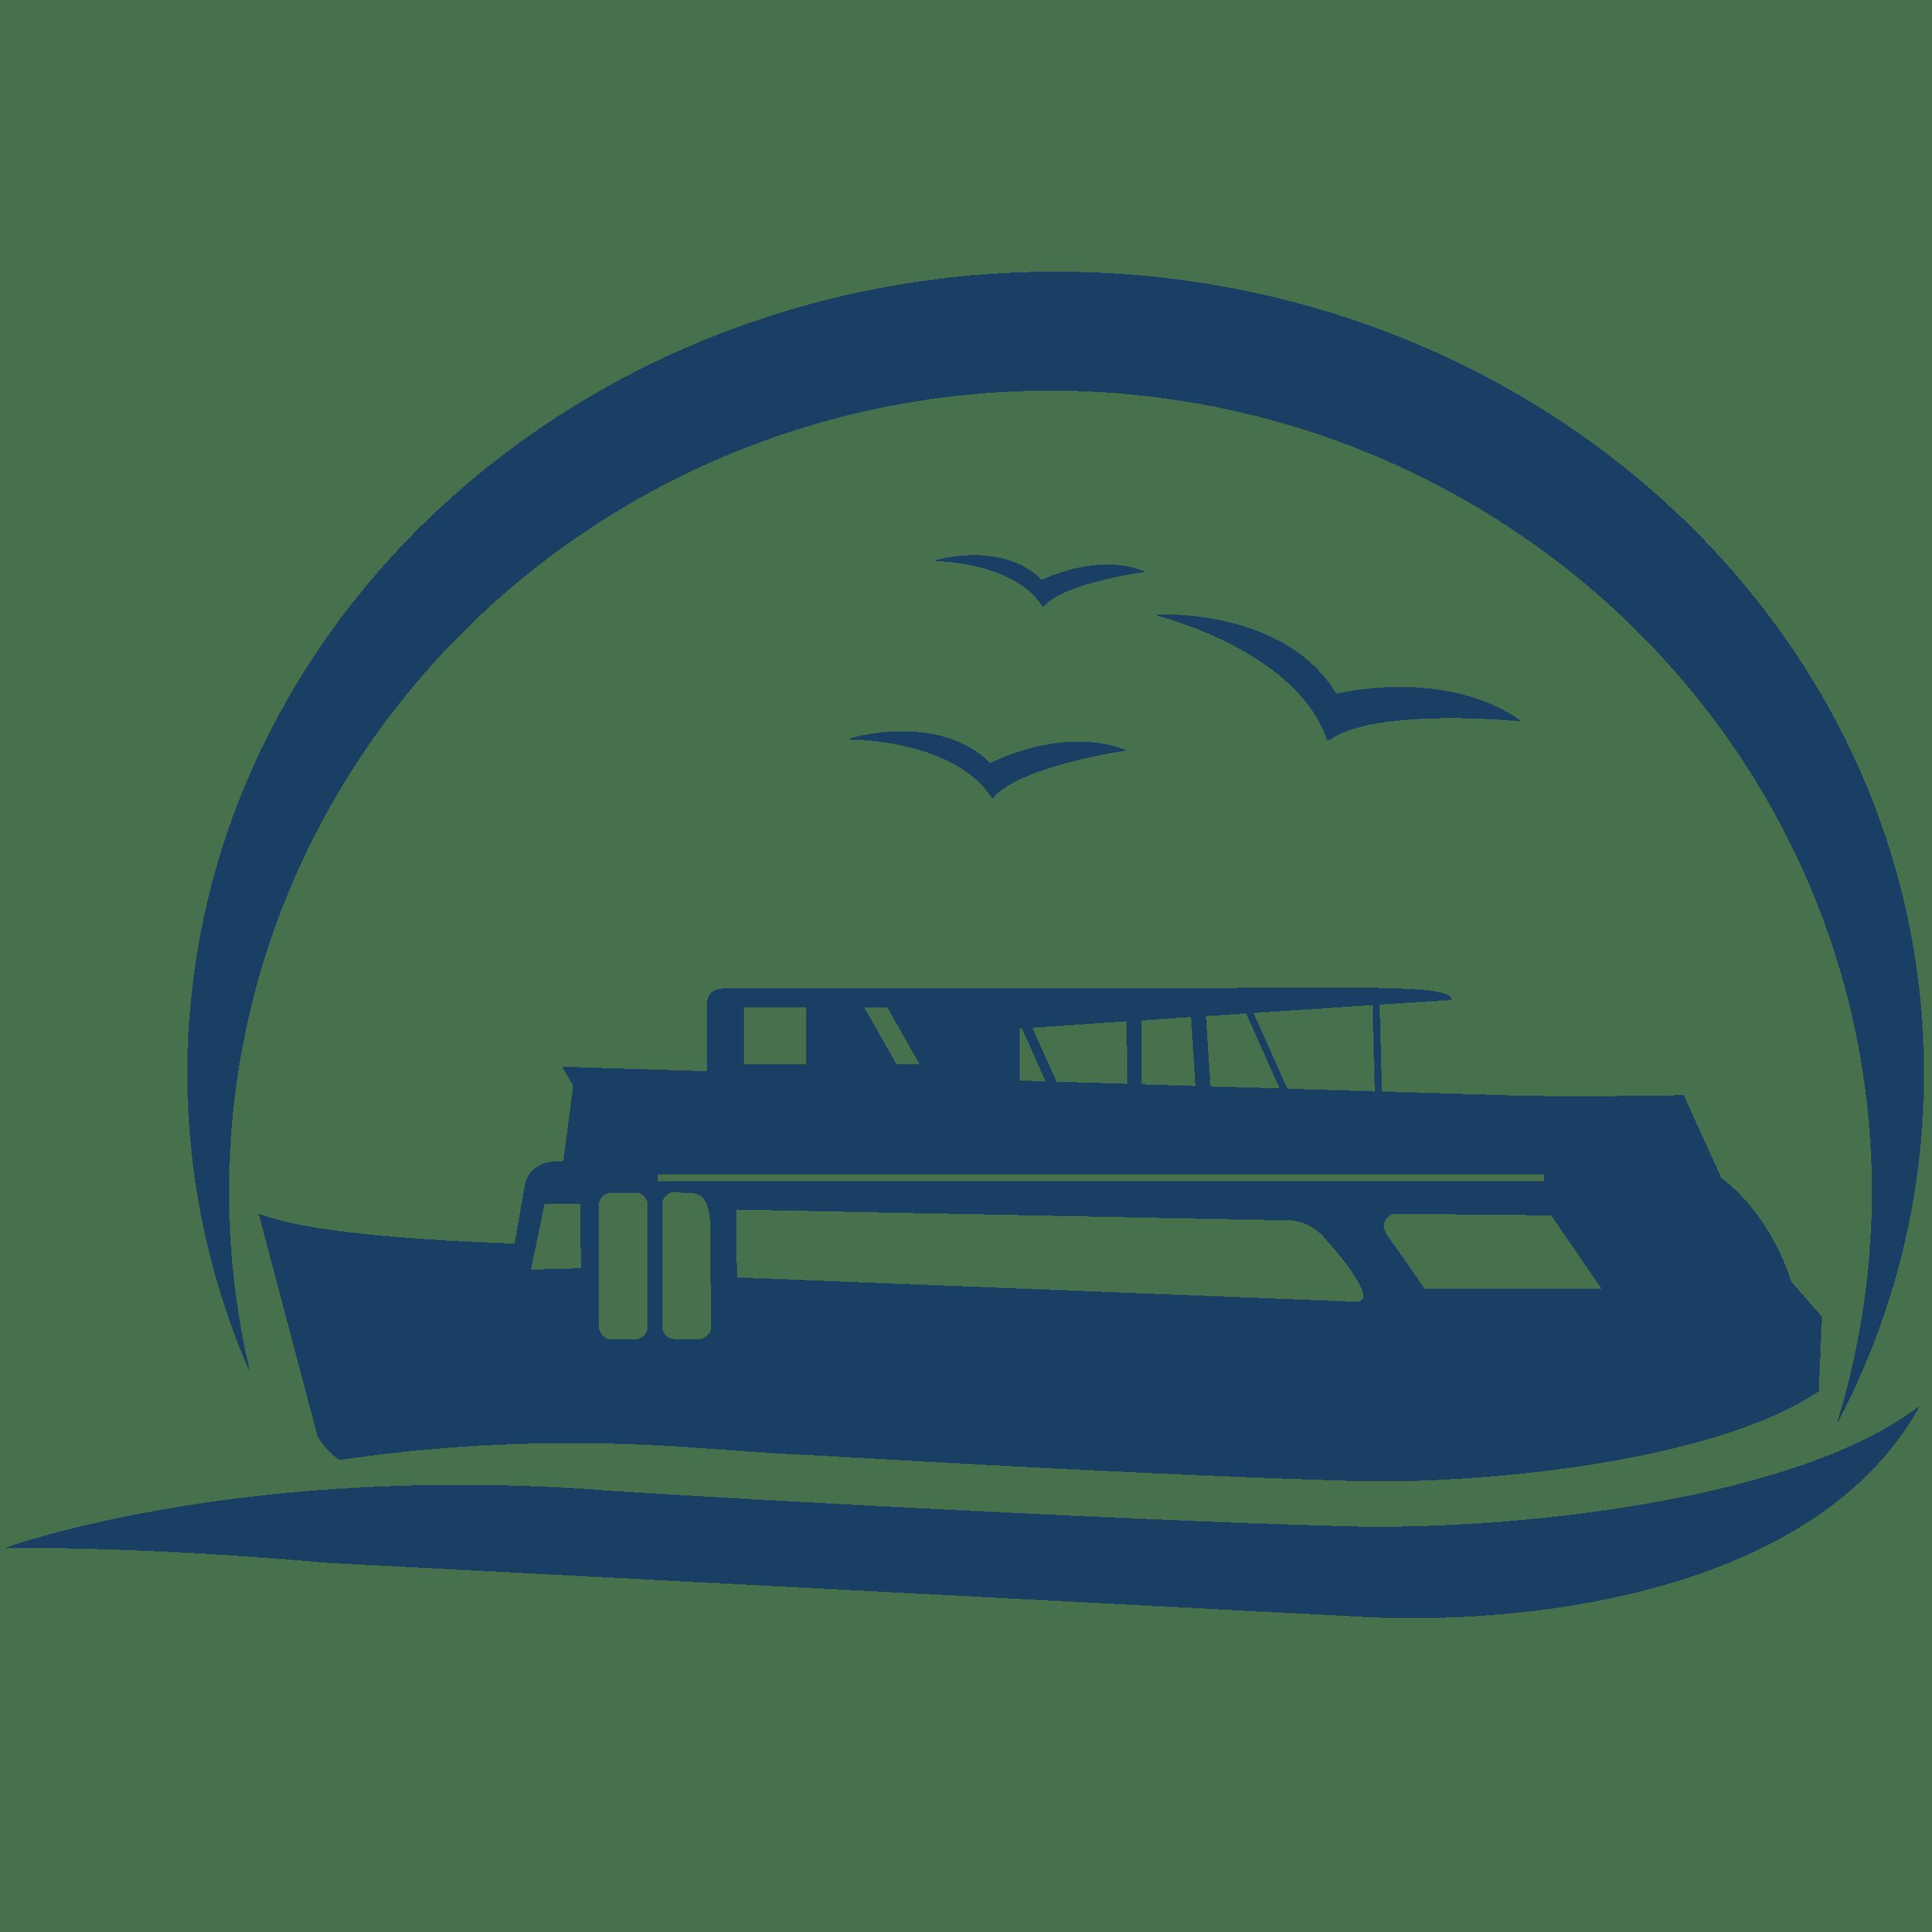 Cruise water vehicle